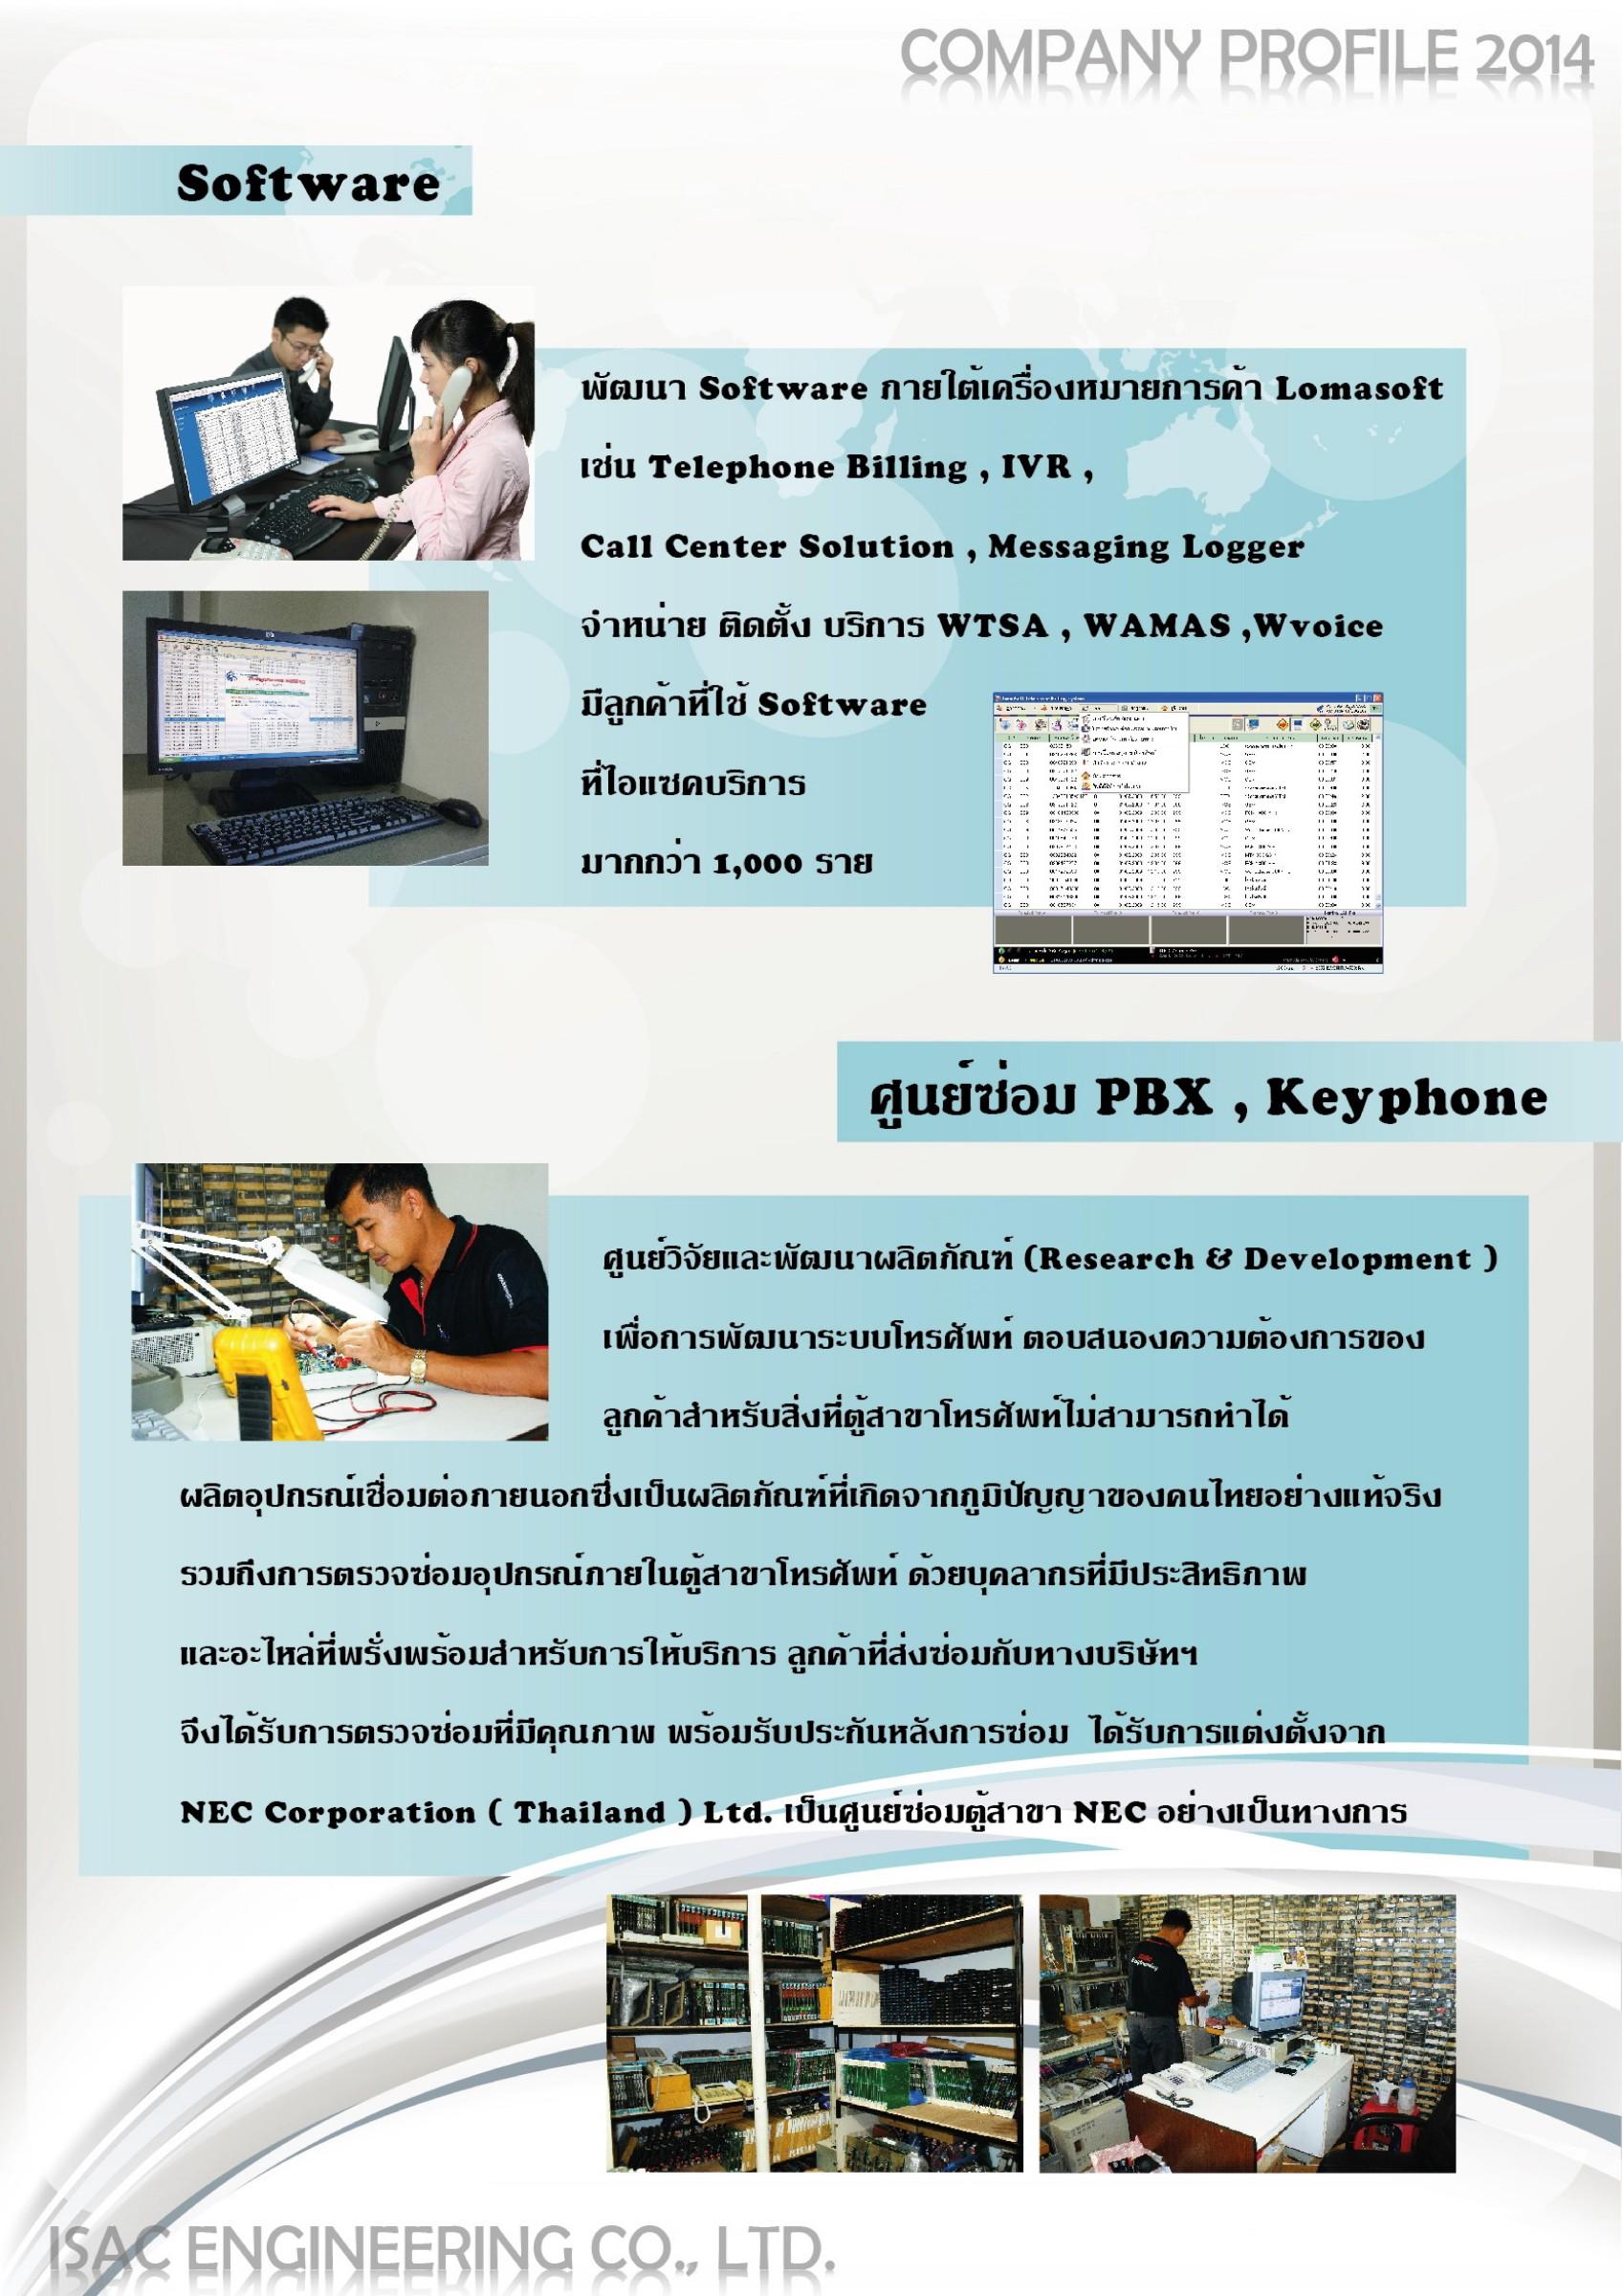 companyprofile2014-page-008